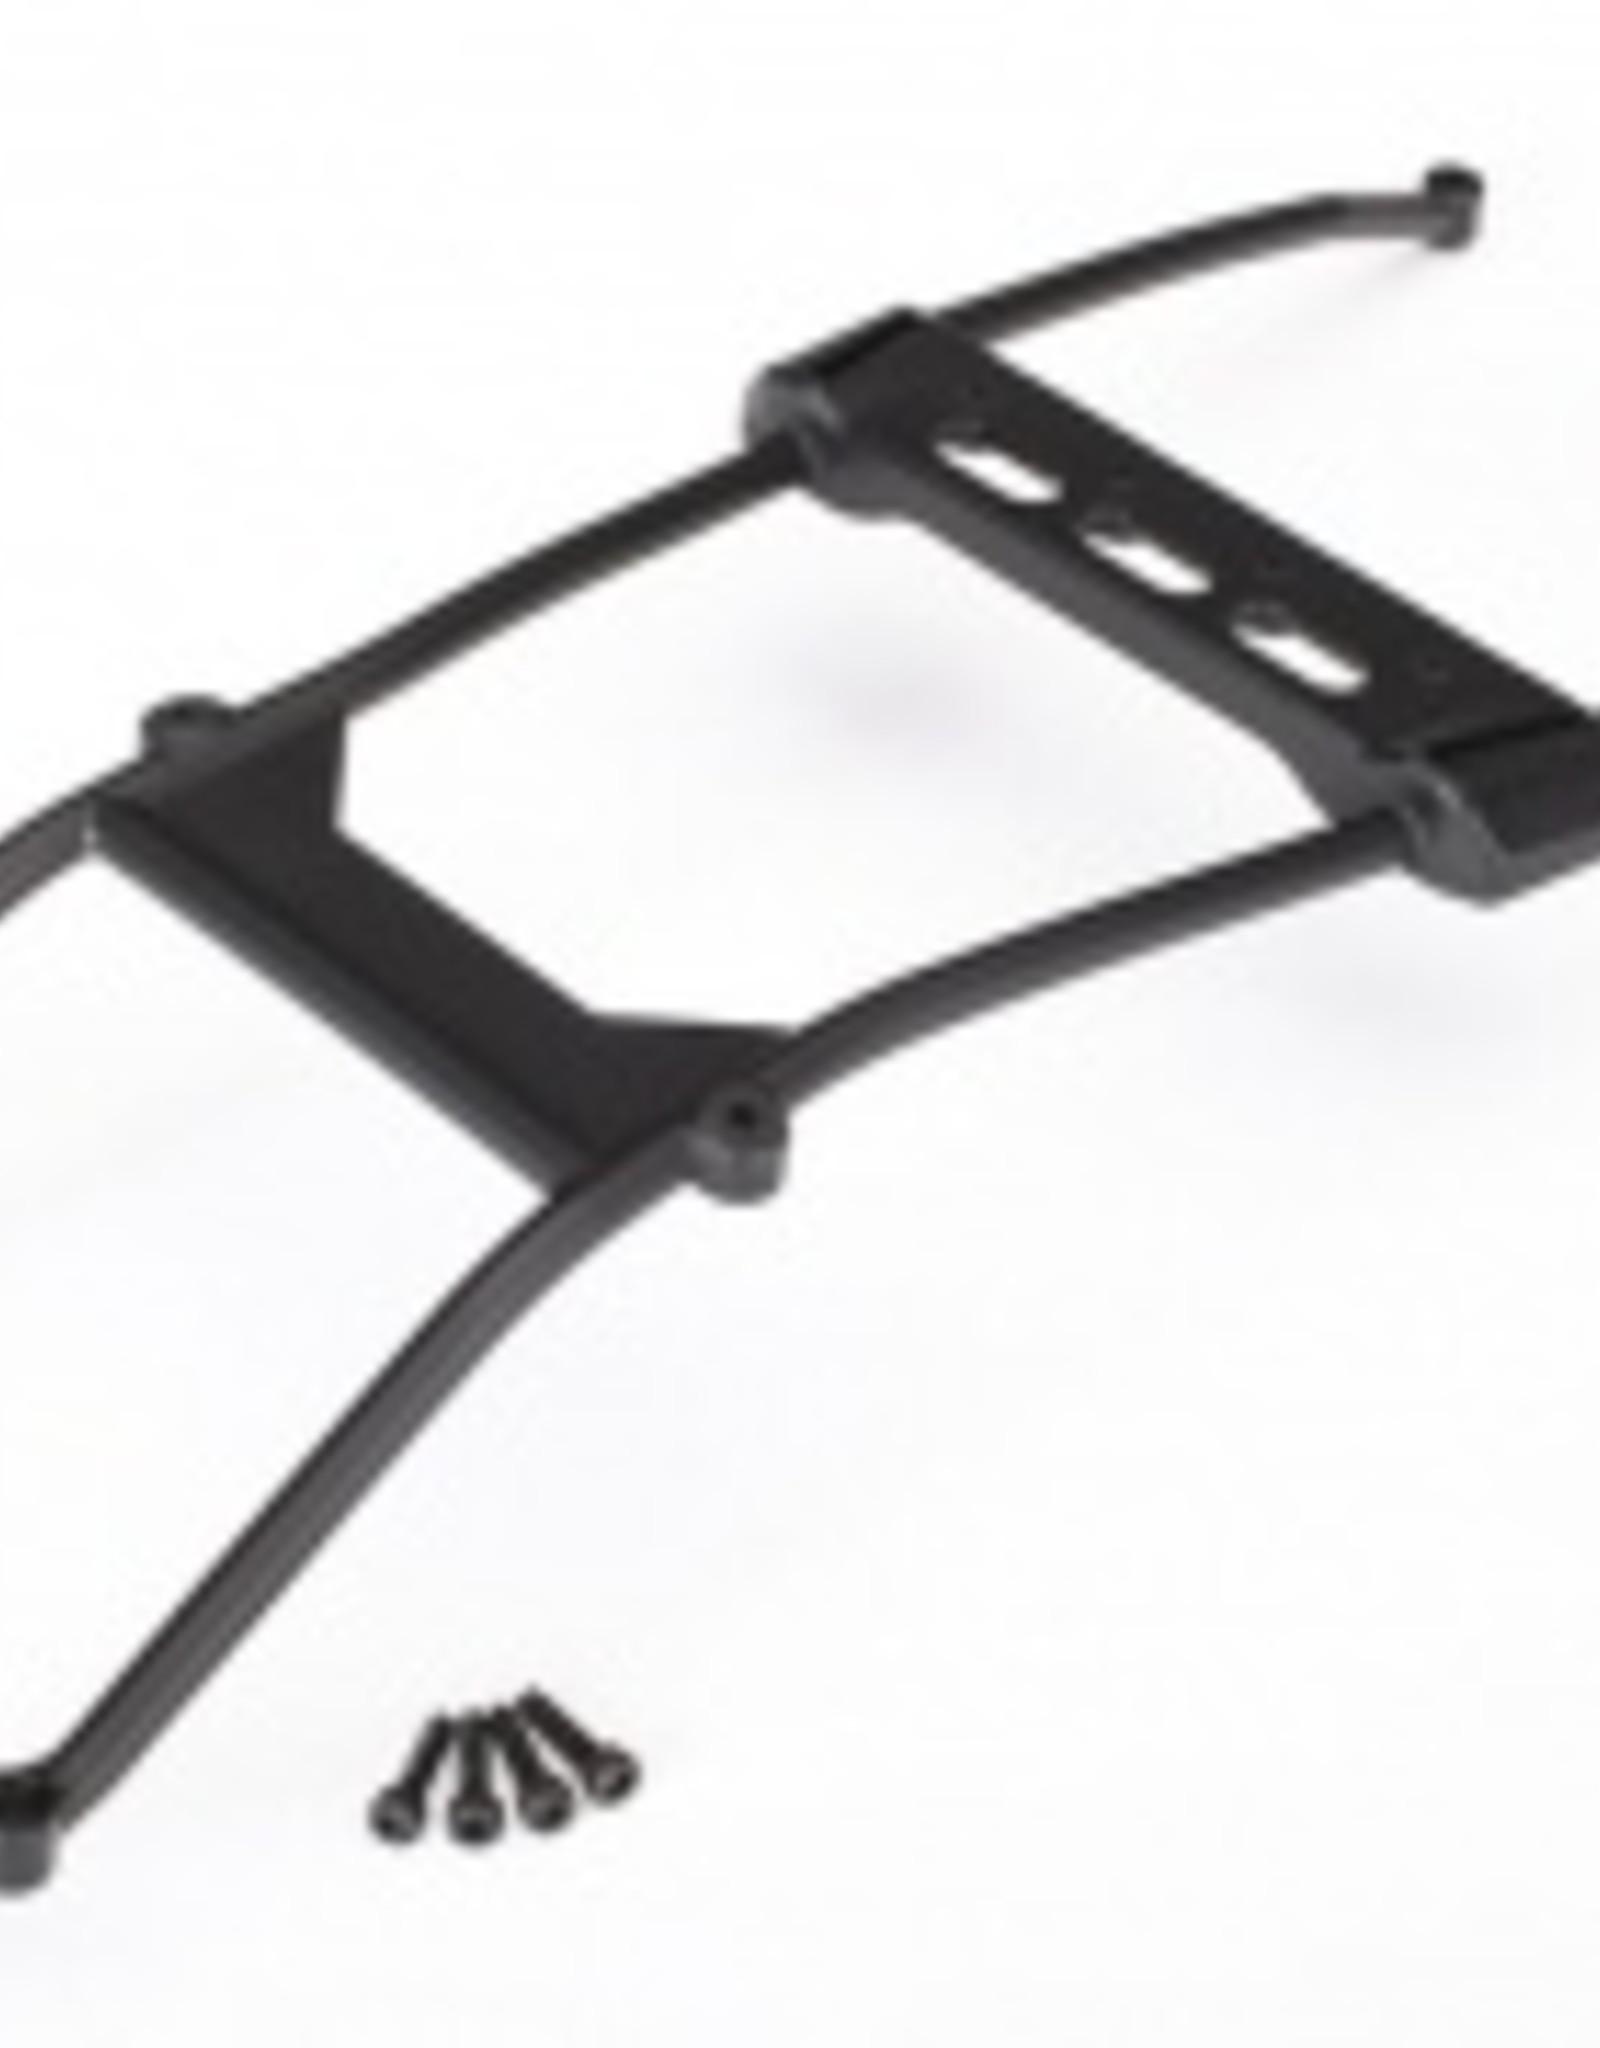 Traxxas Traxxas E-Revo 2.0 Body support/ 3x12mm CS (4)